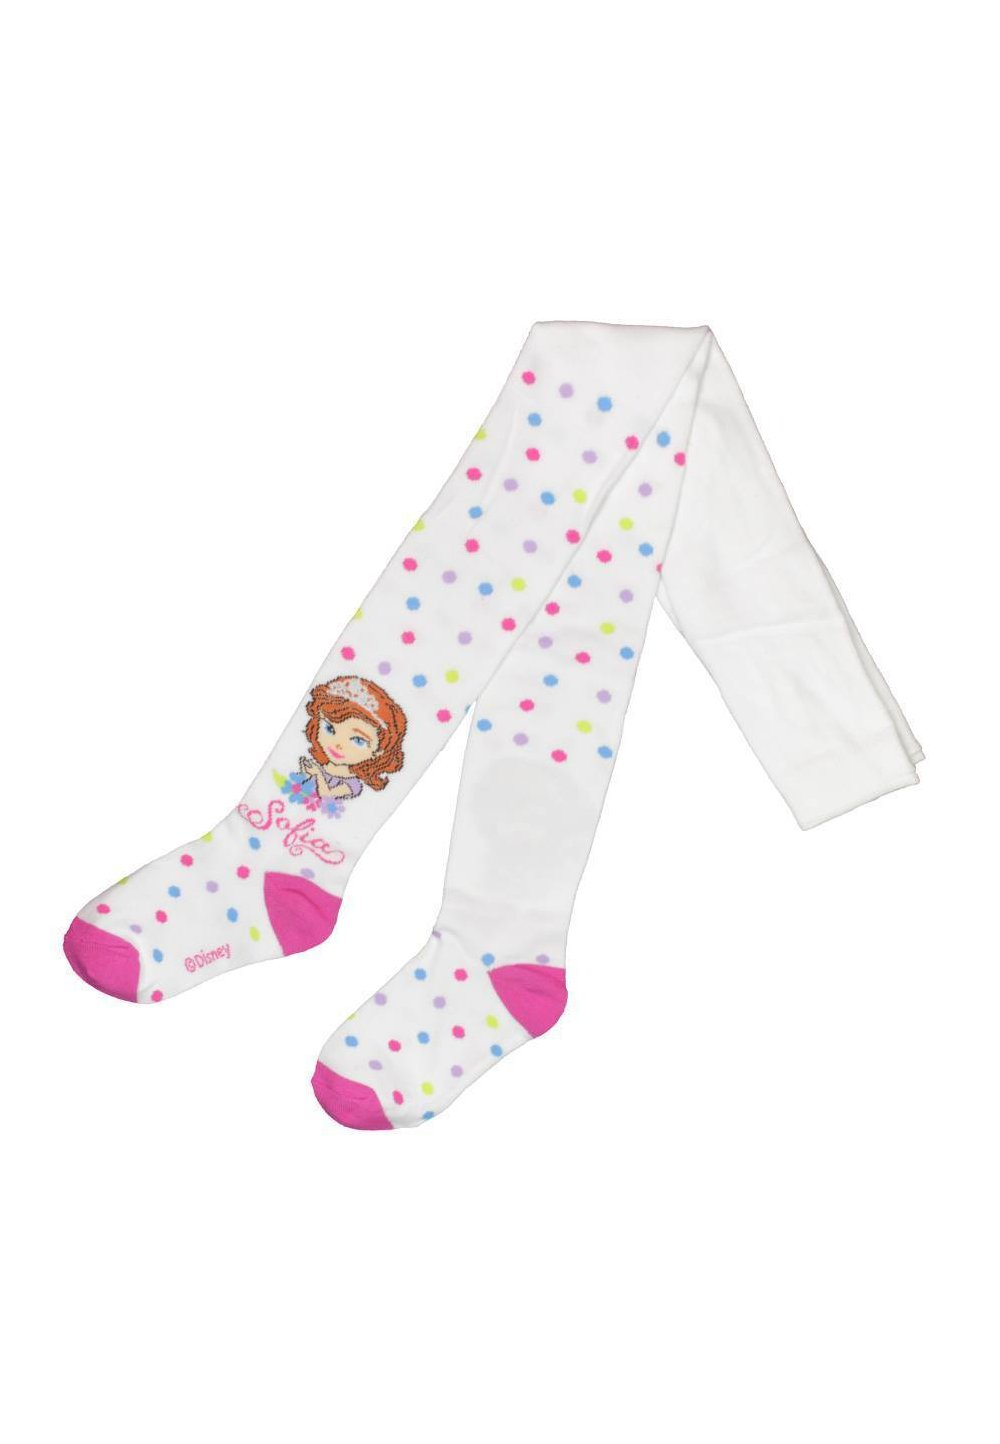 Ciorapi cu chilot Sofia 5168 imagine